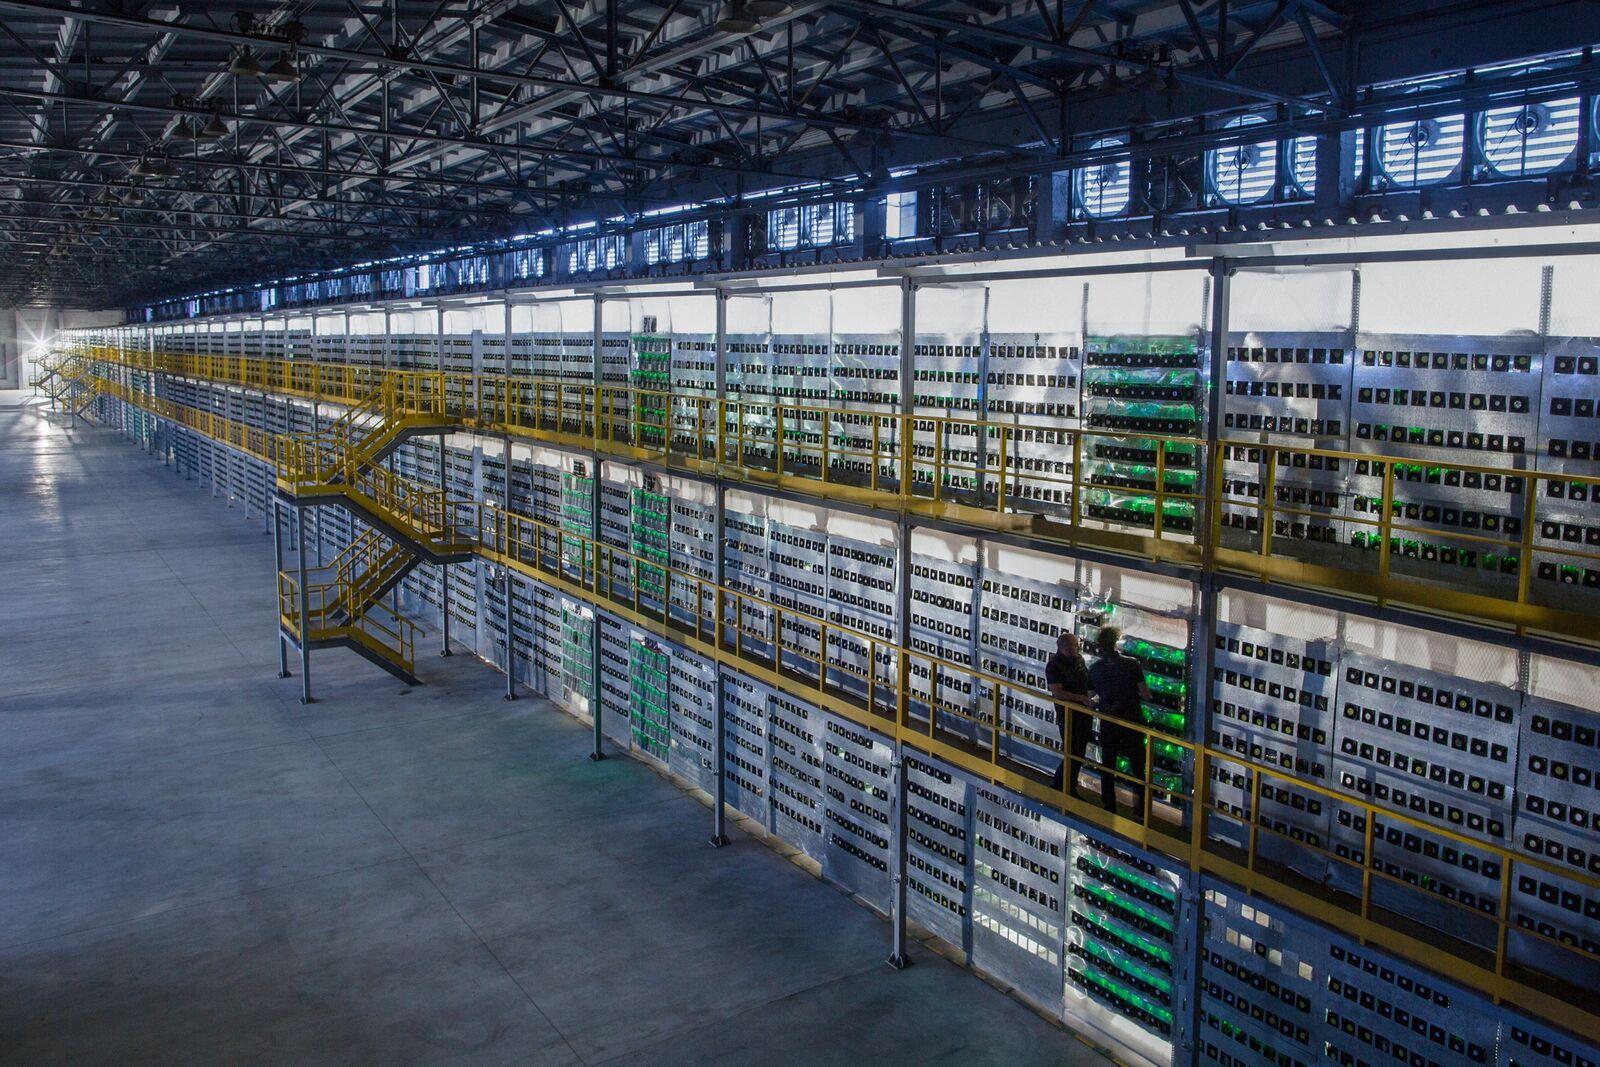 Siberian Crypo- Inside Russias Biggest Bitcoin Farm